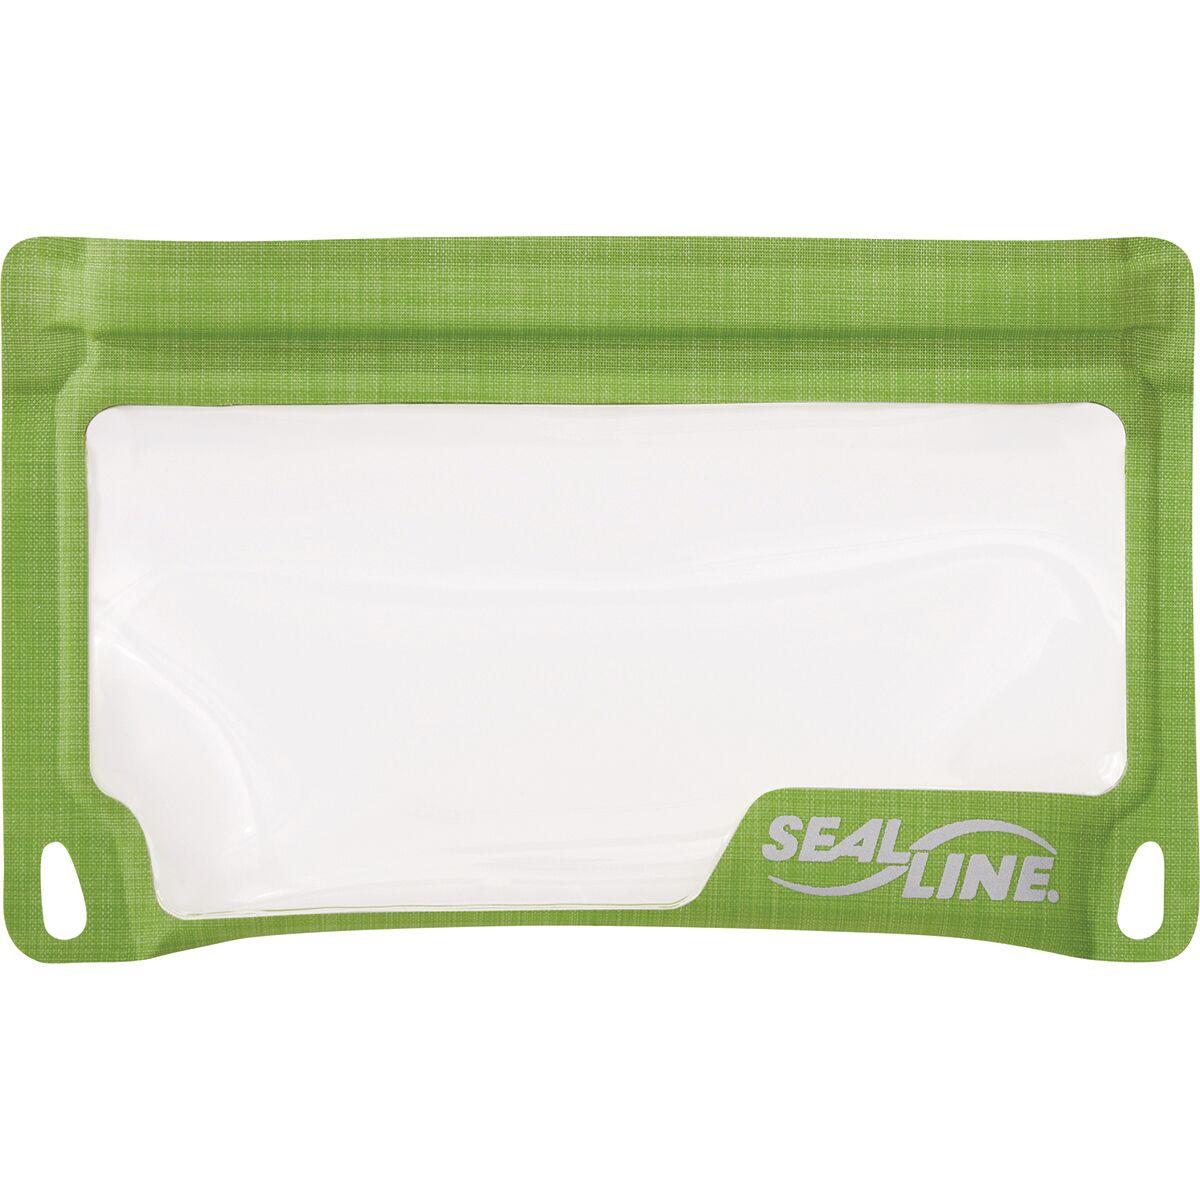 Waterproof Soft Cases